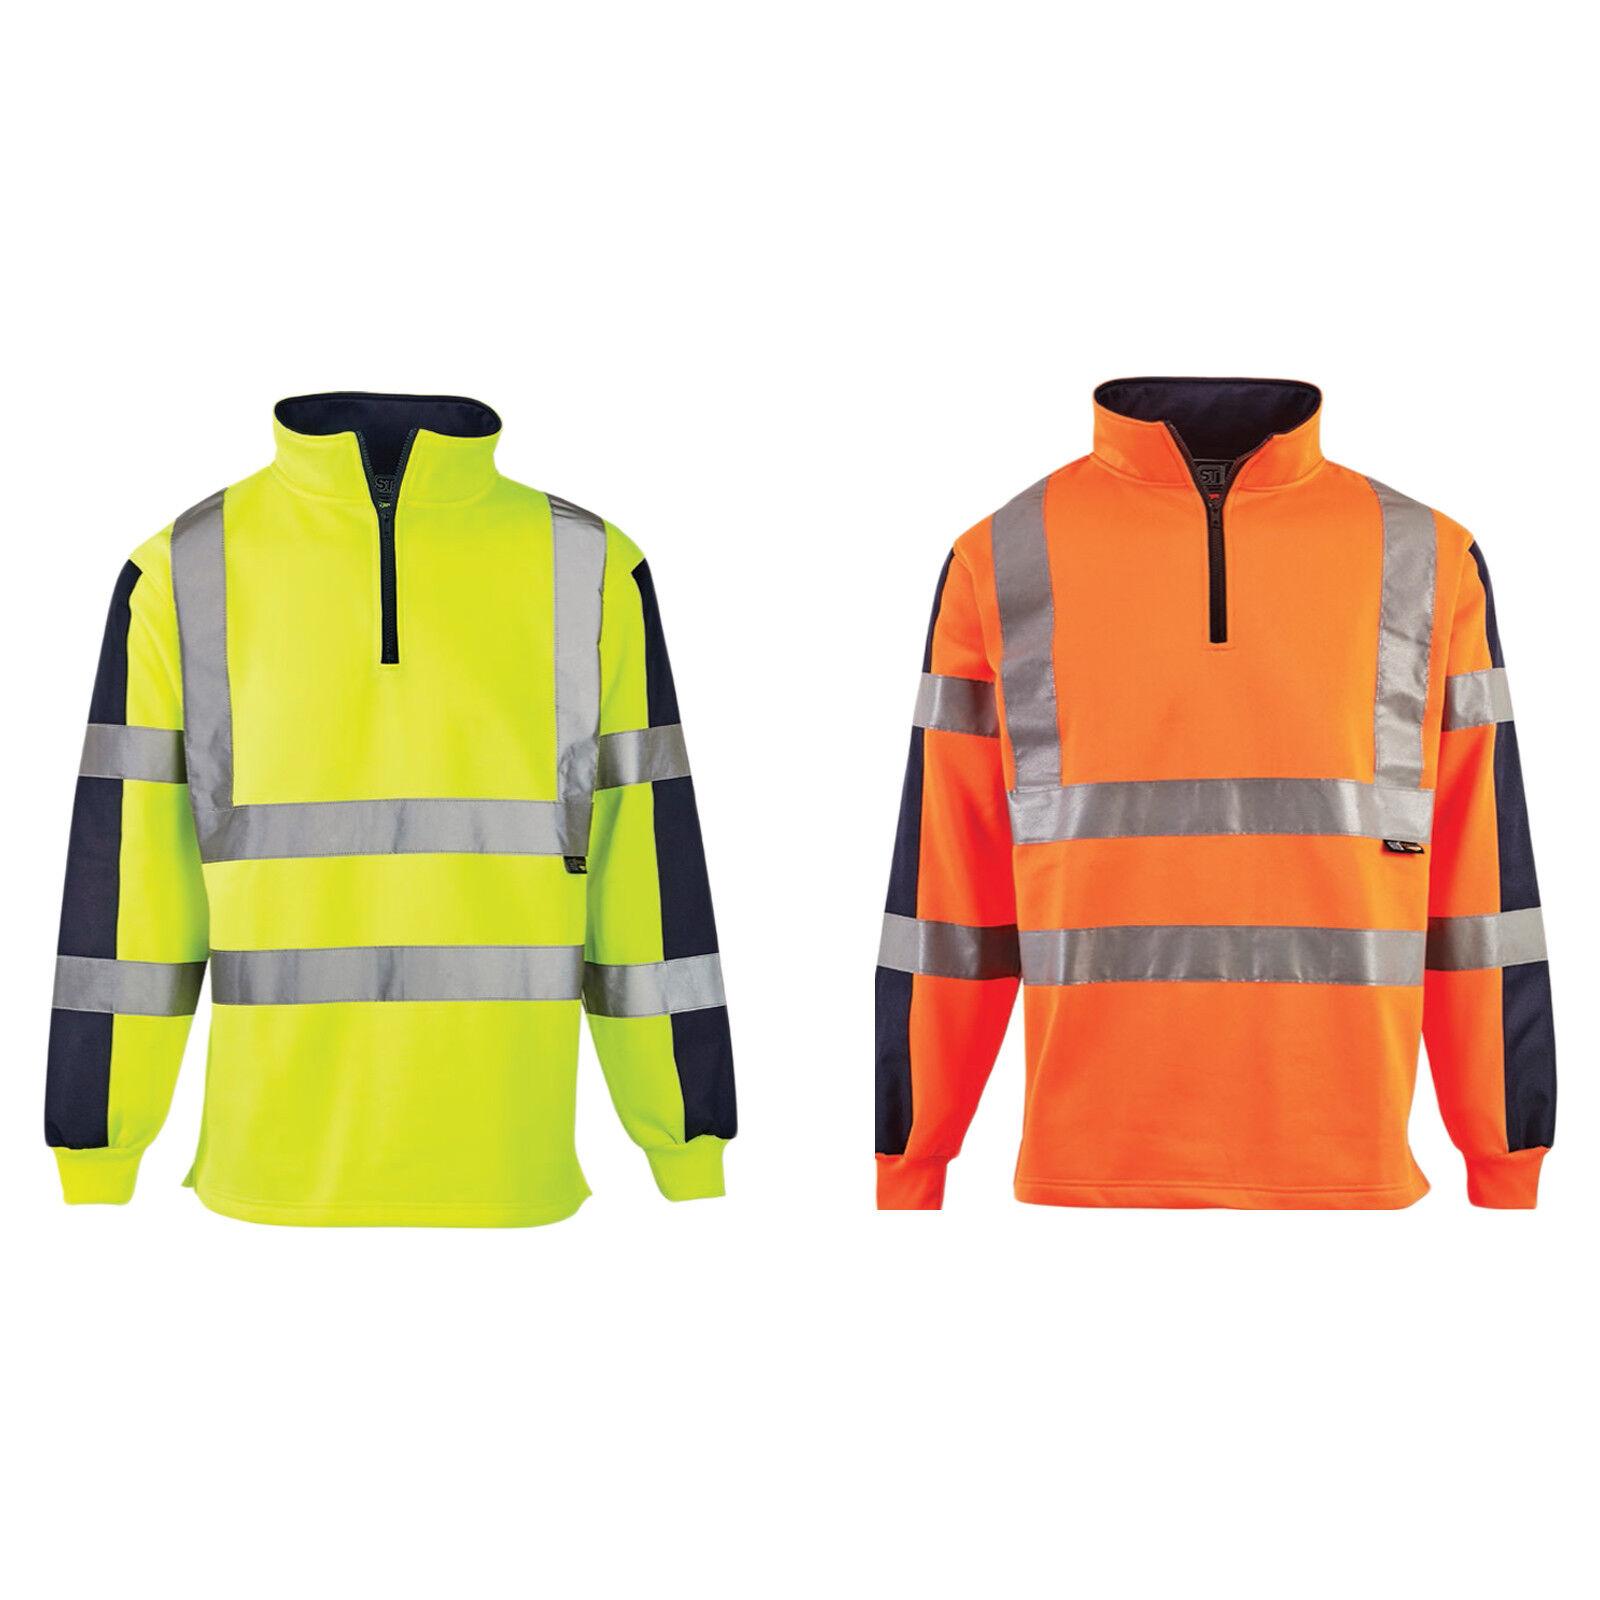 High Visibility Full-Zip Fleece Jacket Hi-Viz Work Uniform Safety Workwear Top